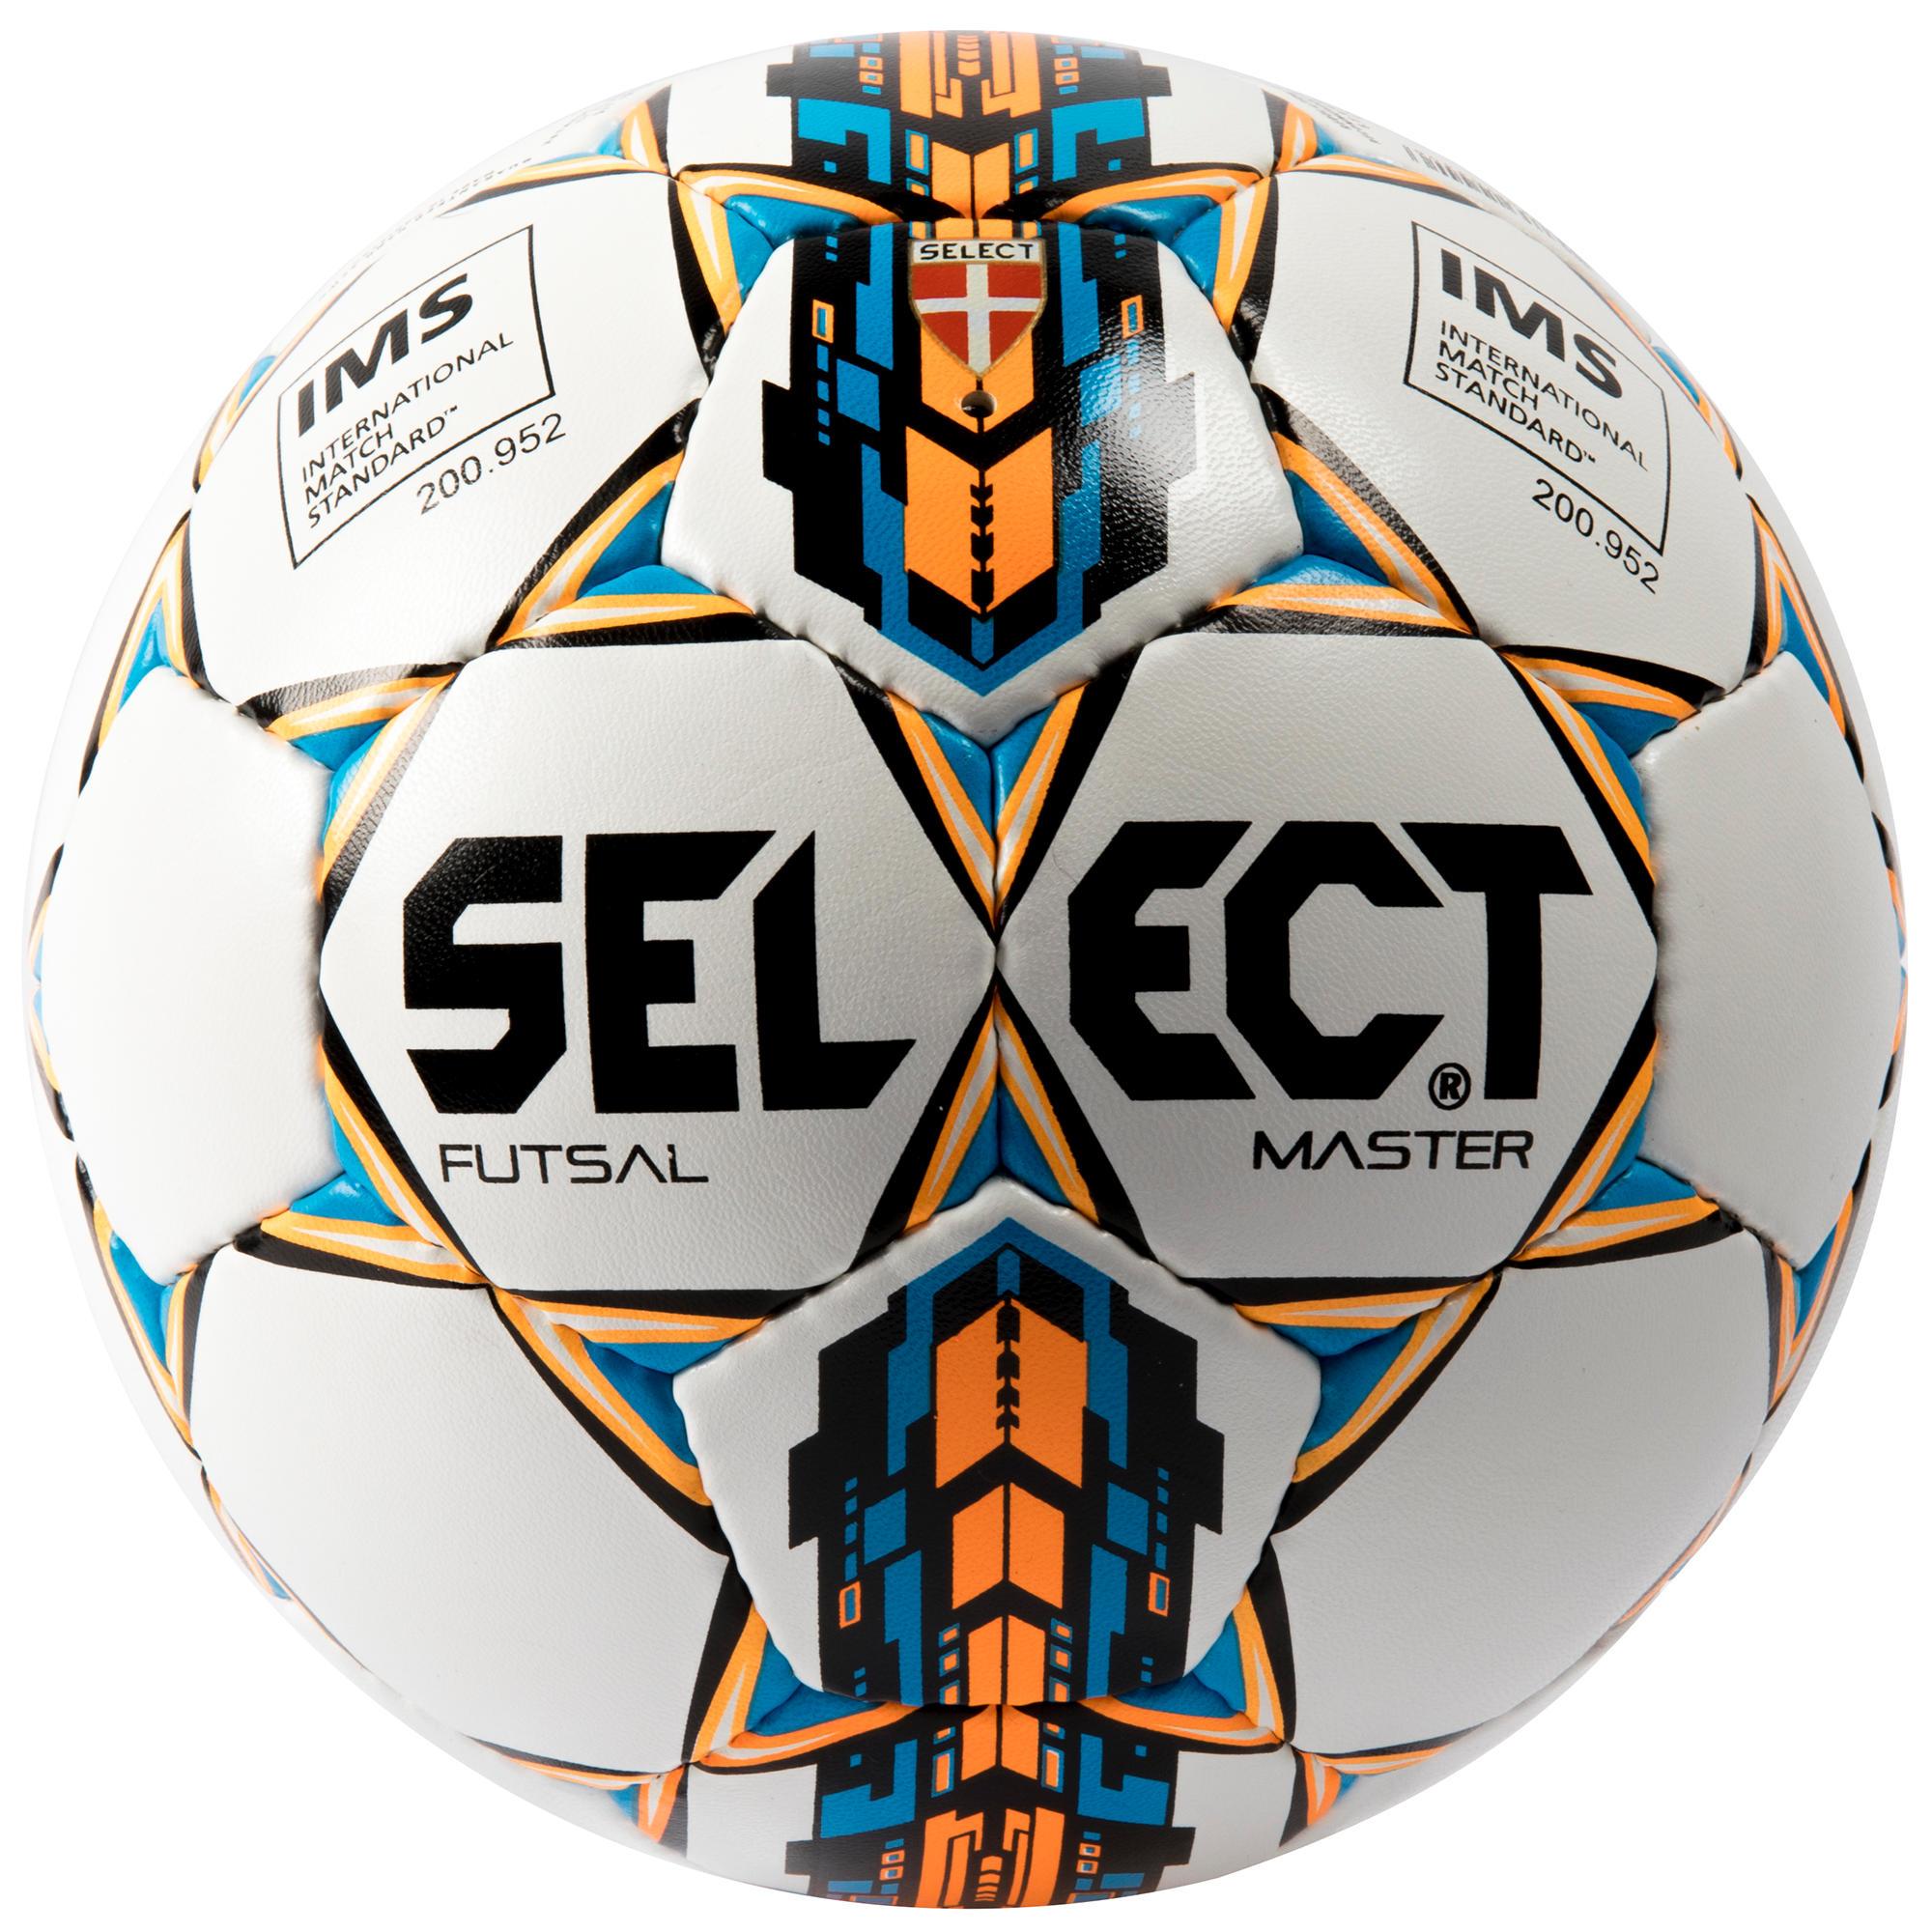 Select handball Futsal Master Indoor online kopen